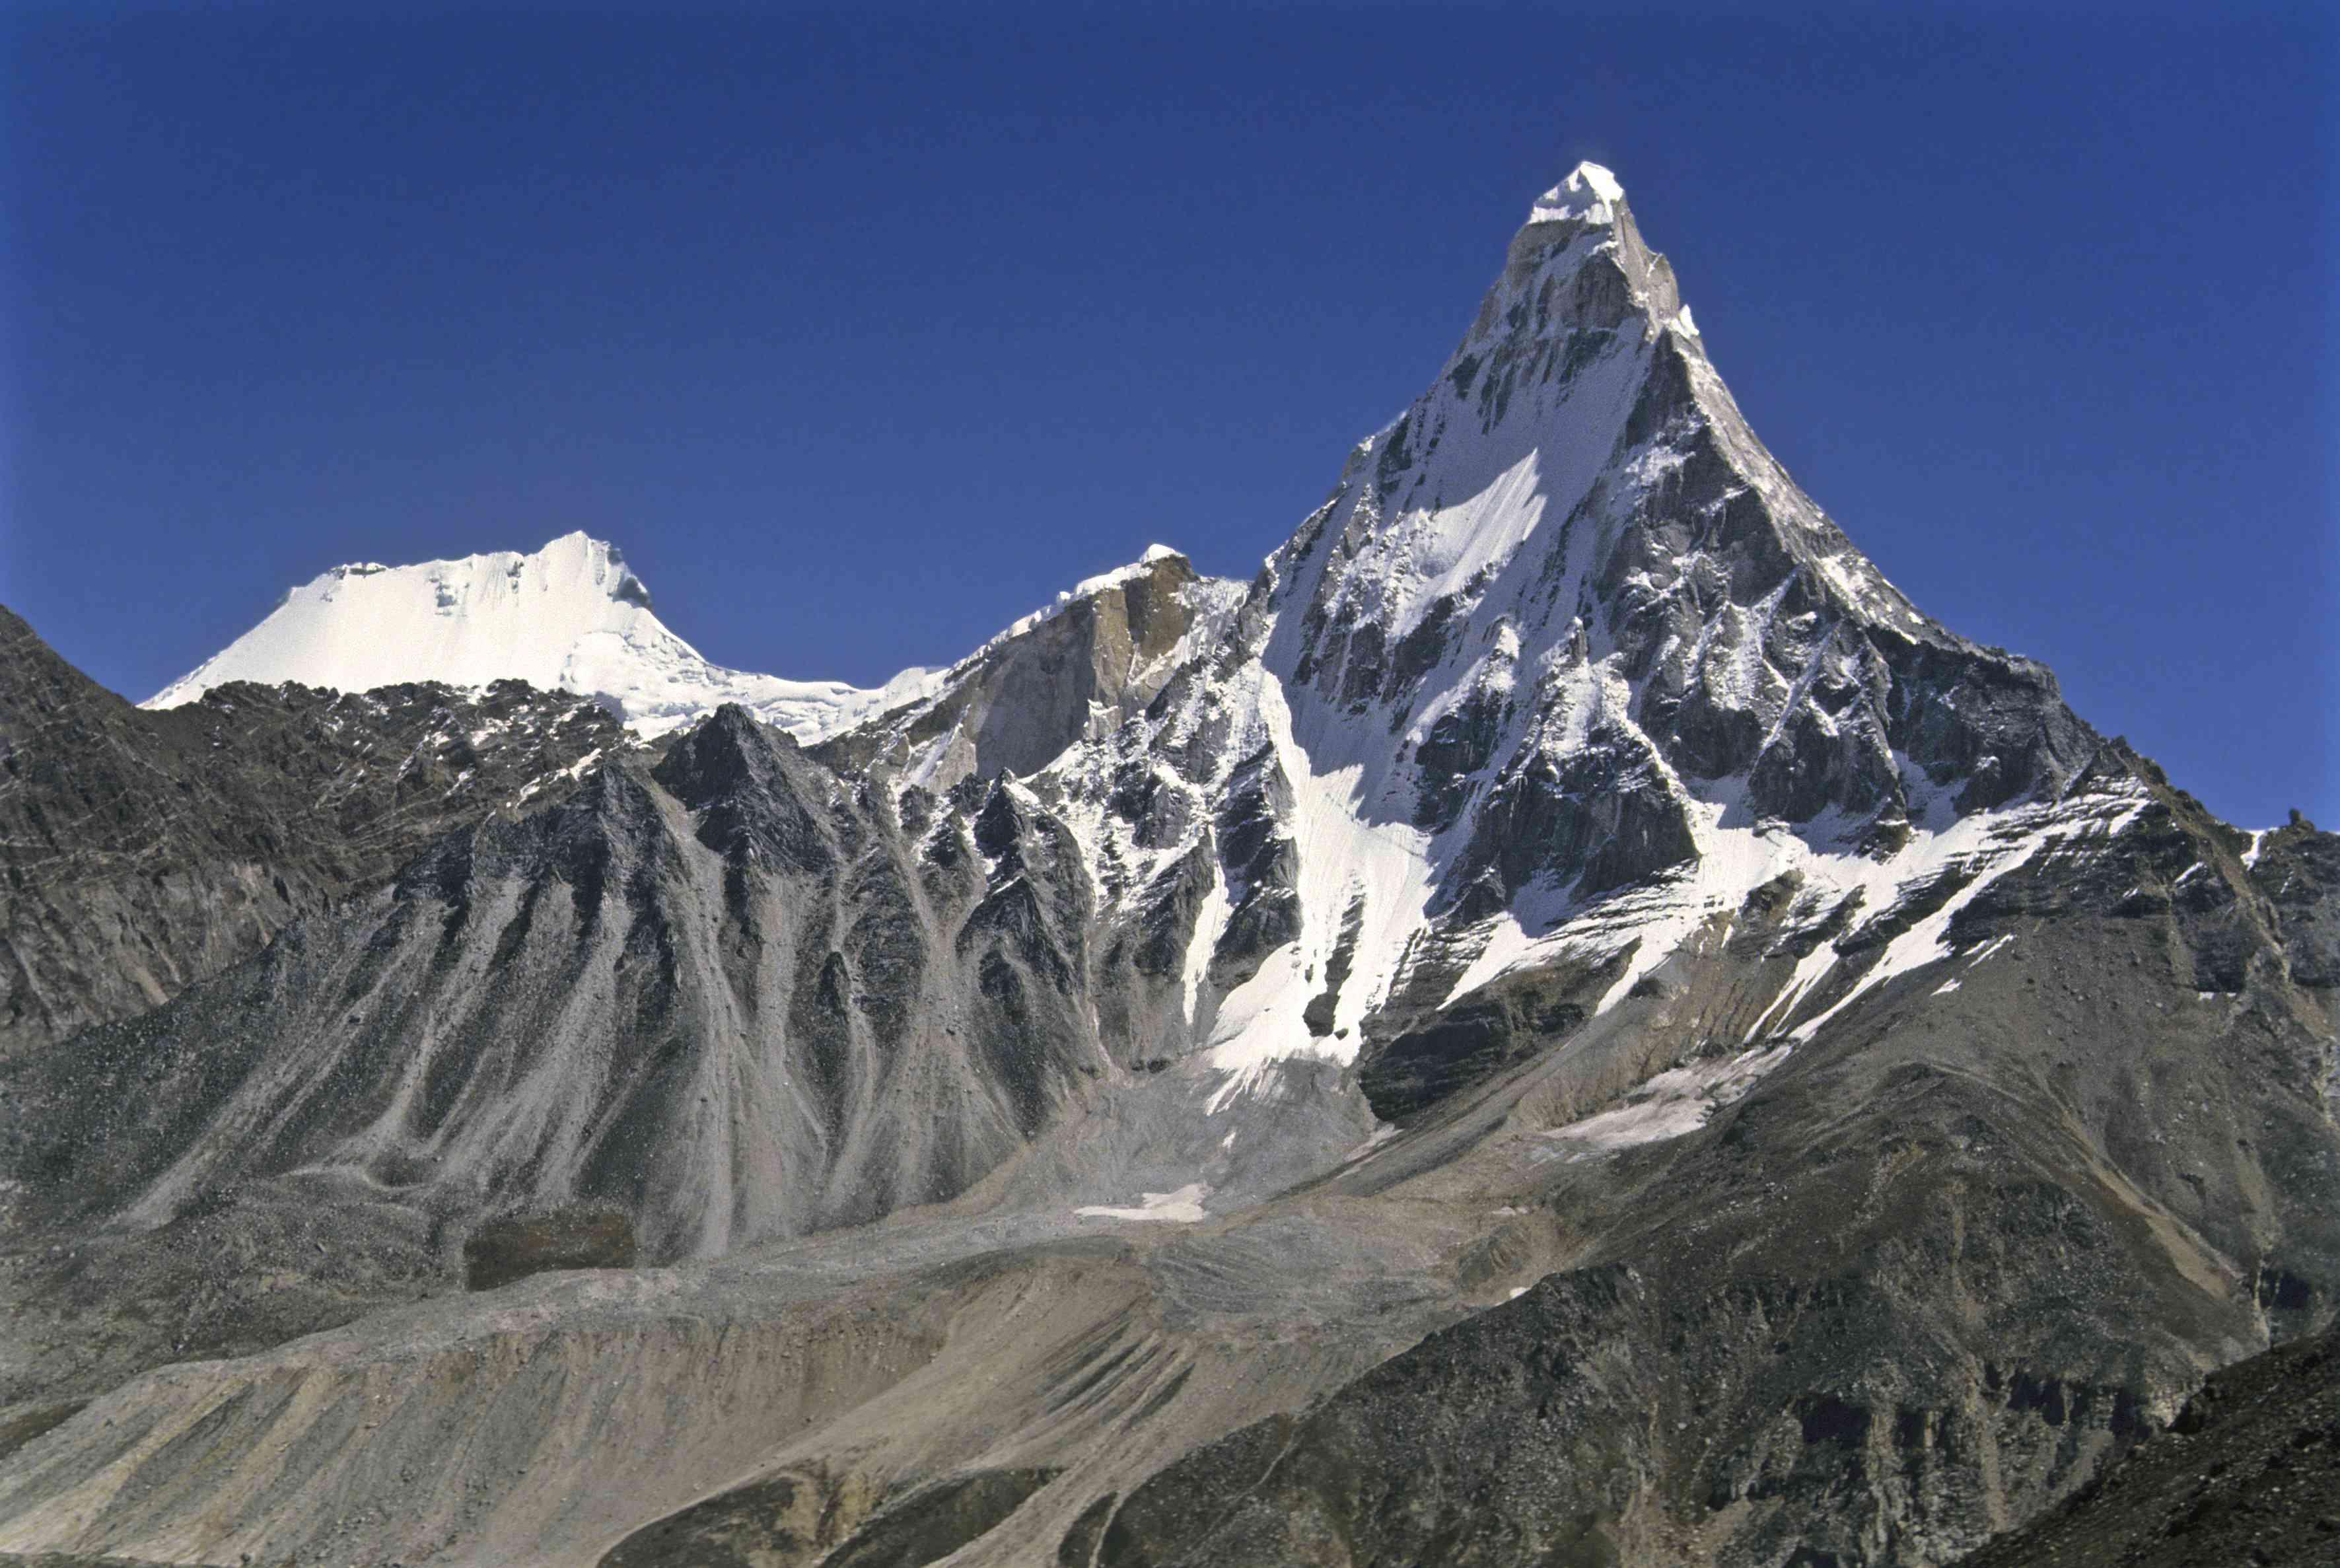 View of the Gangotri glacier on Shivling peak